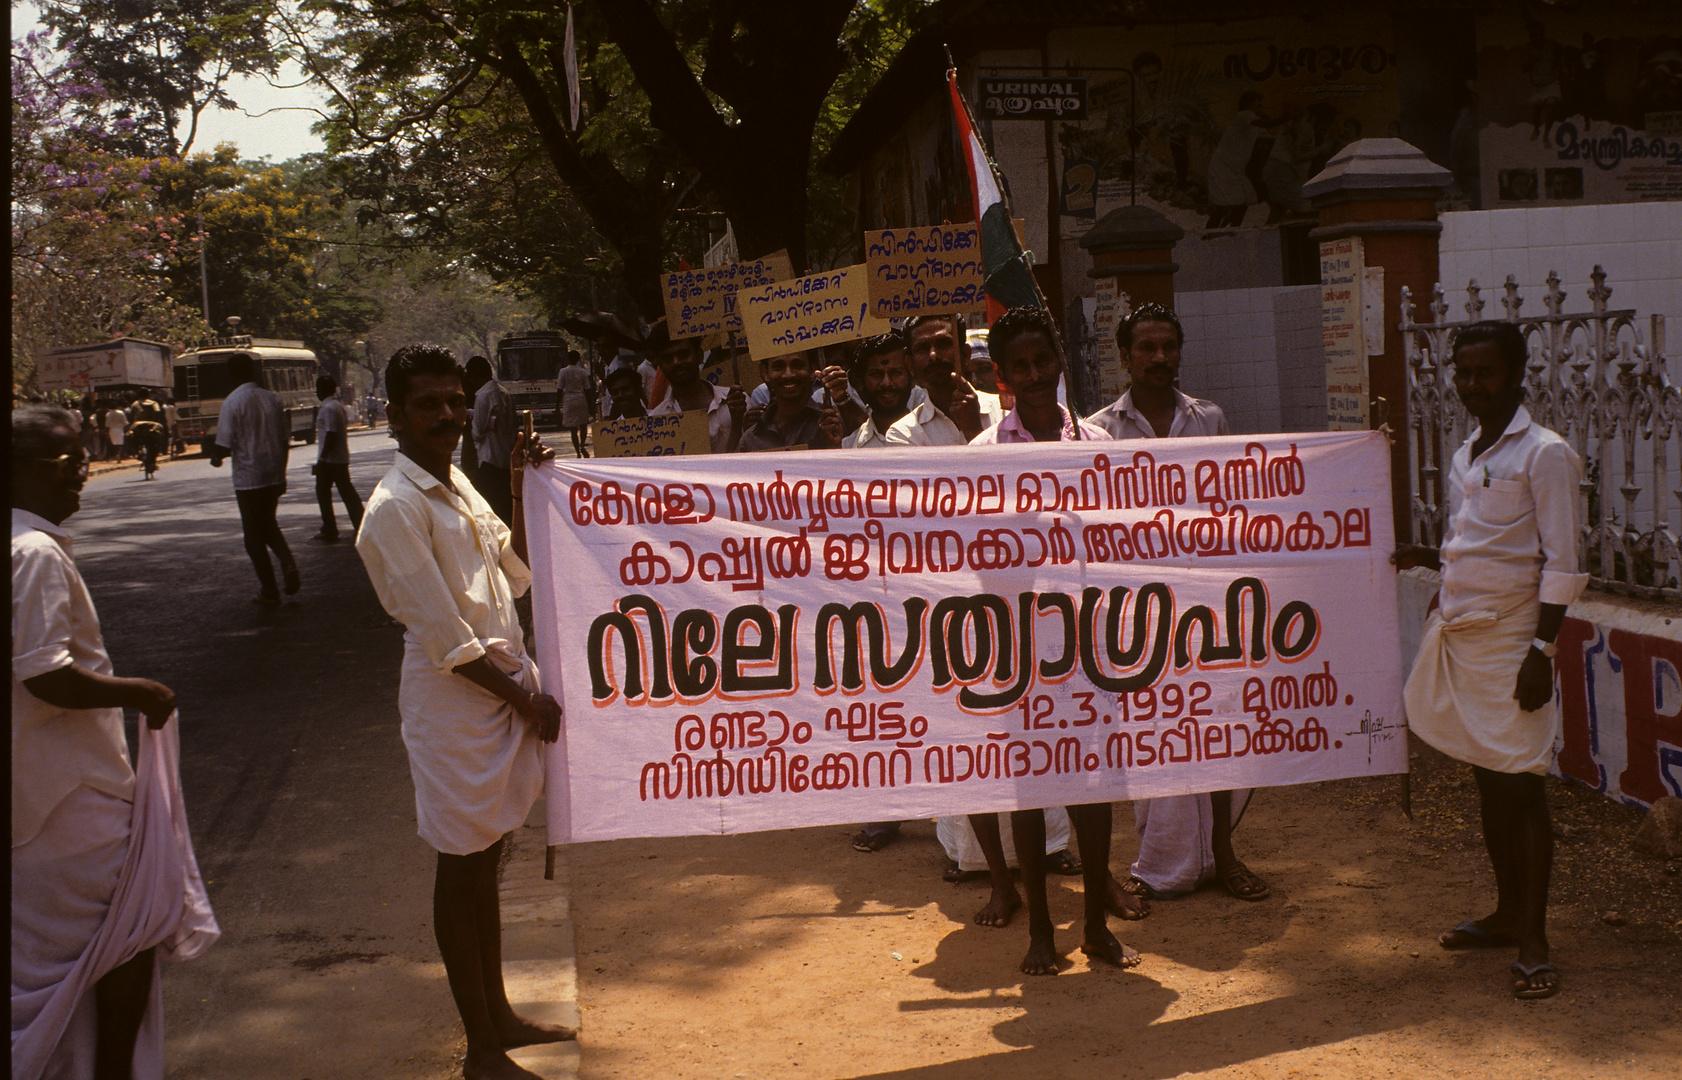 Demonstration in Trivandrum (Kerala)